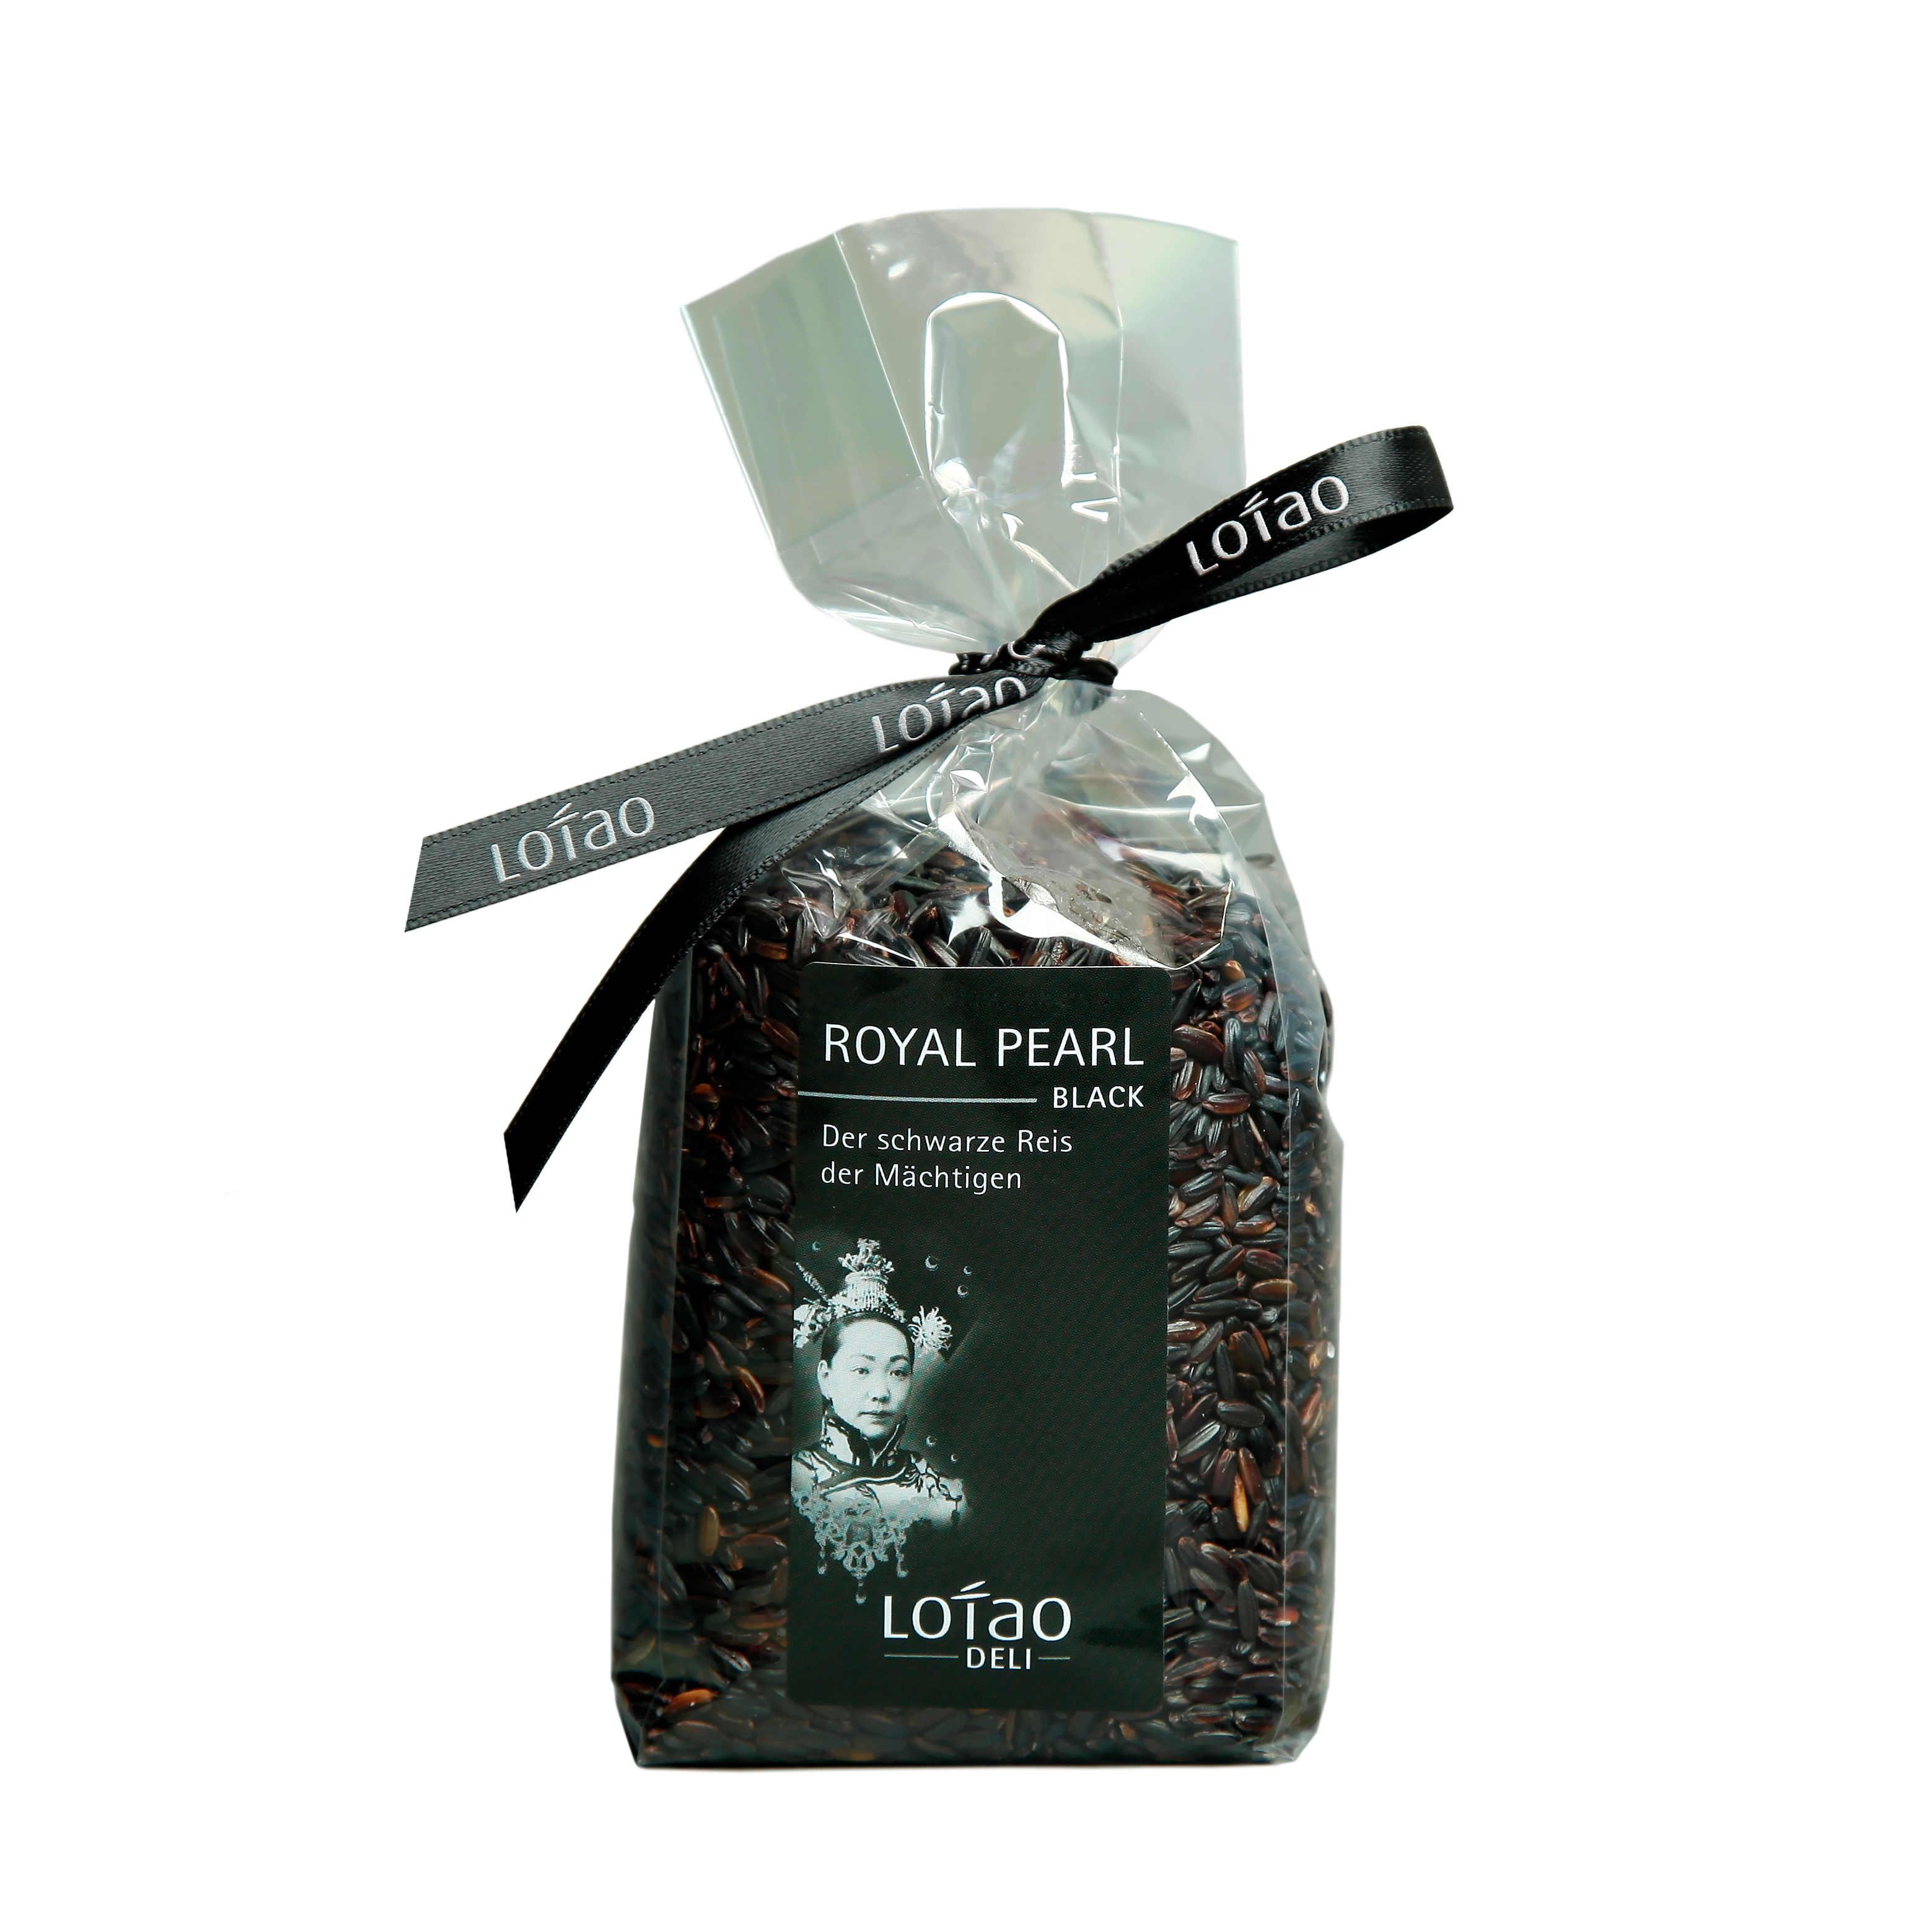 Lotao Royal Pearl Black - Product